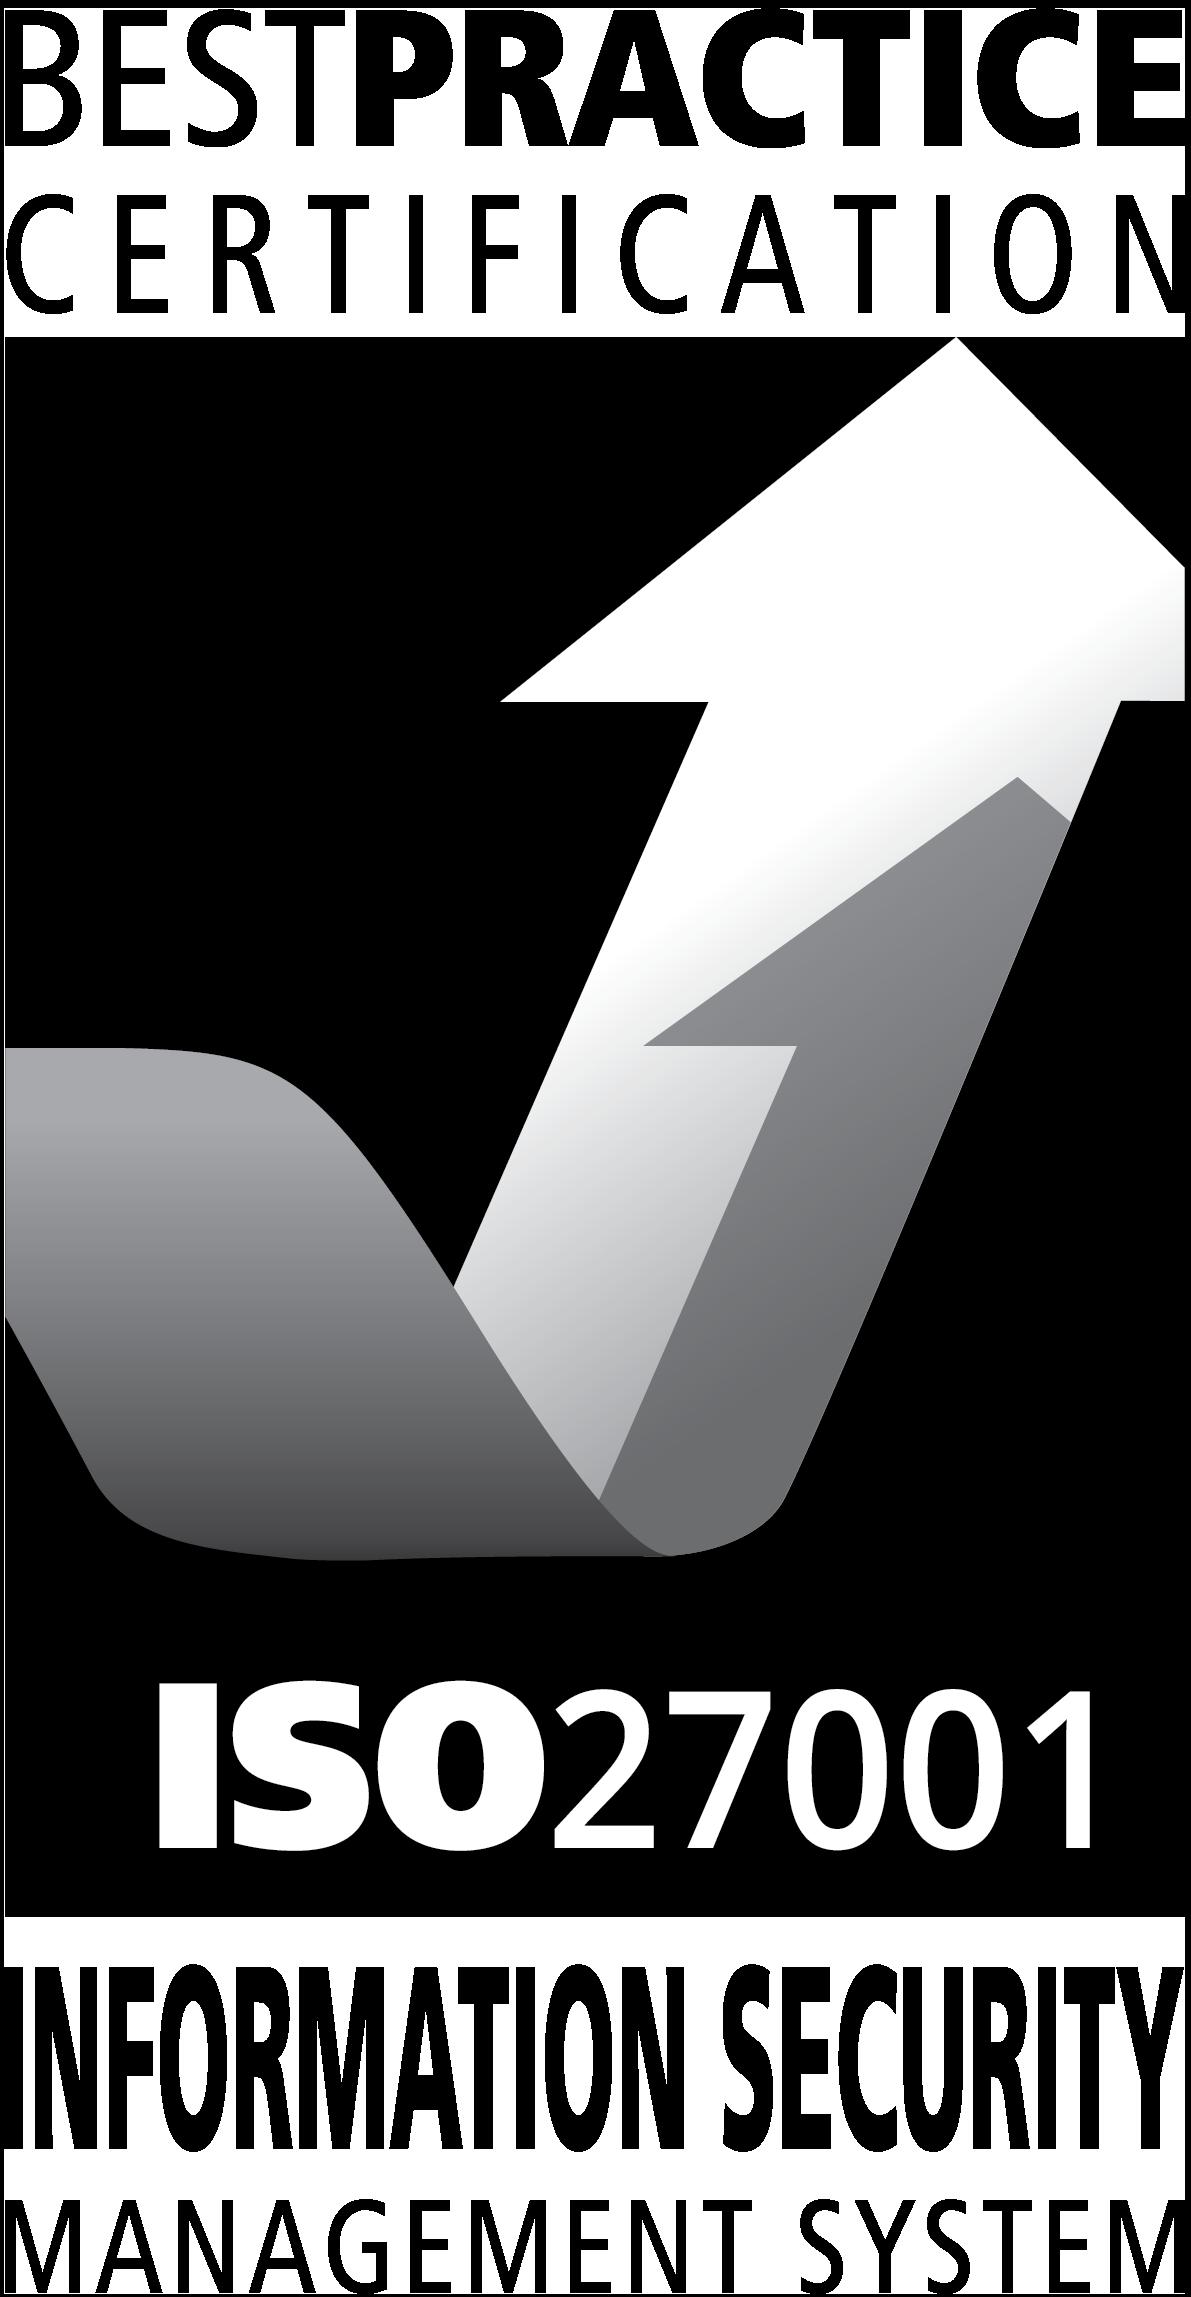 BP_ISO27001_Logo_Original_Size.png